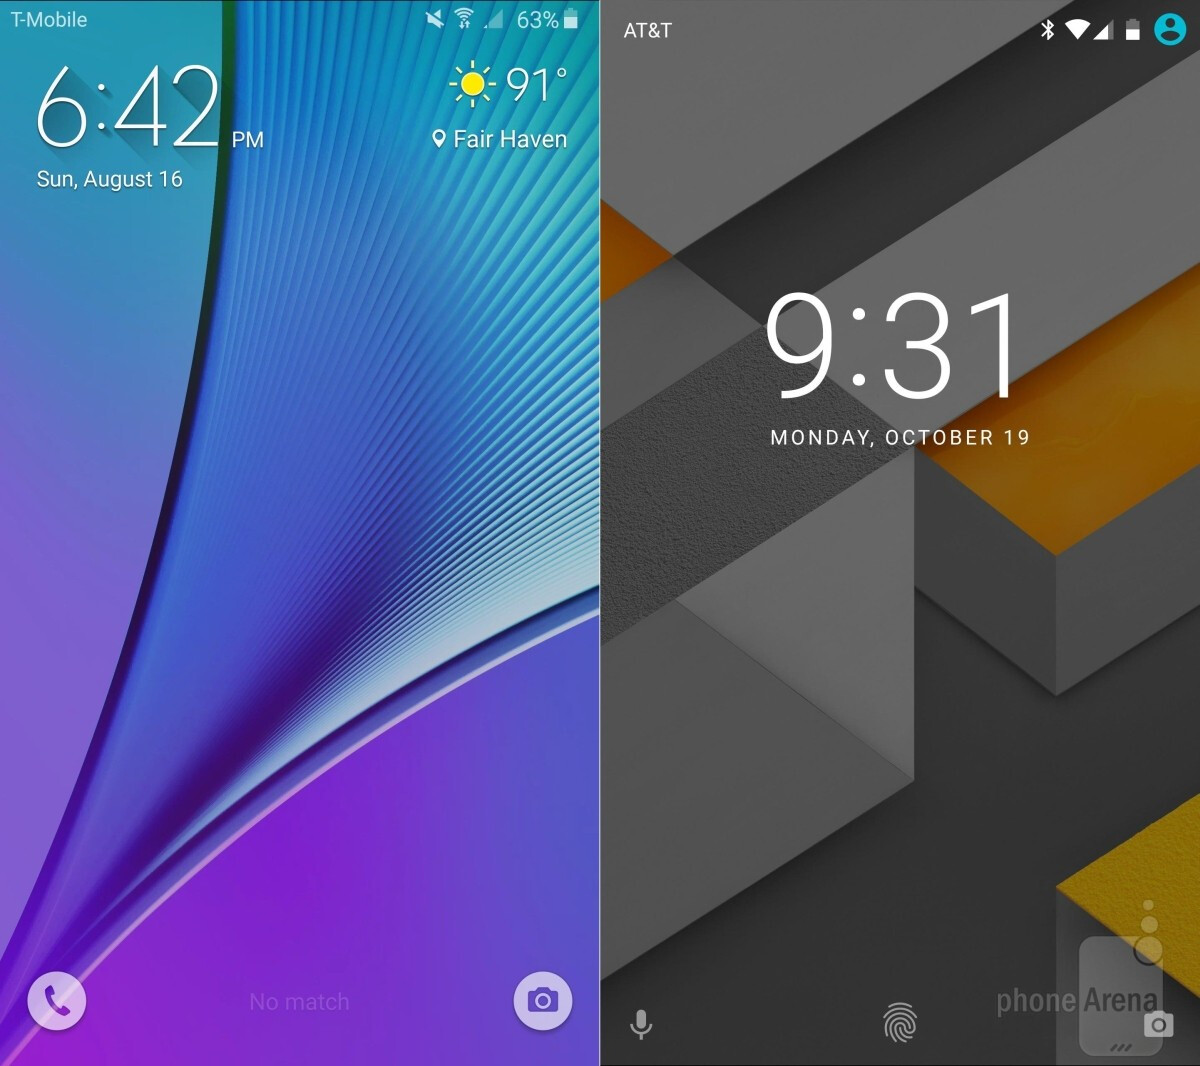 Note 5 (left) vs Nexus 6P (right)